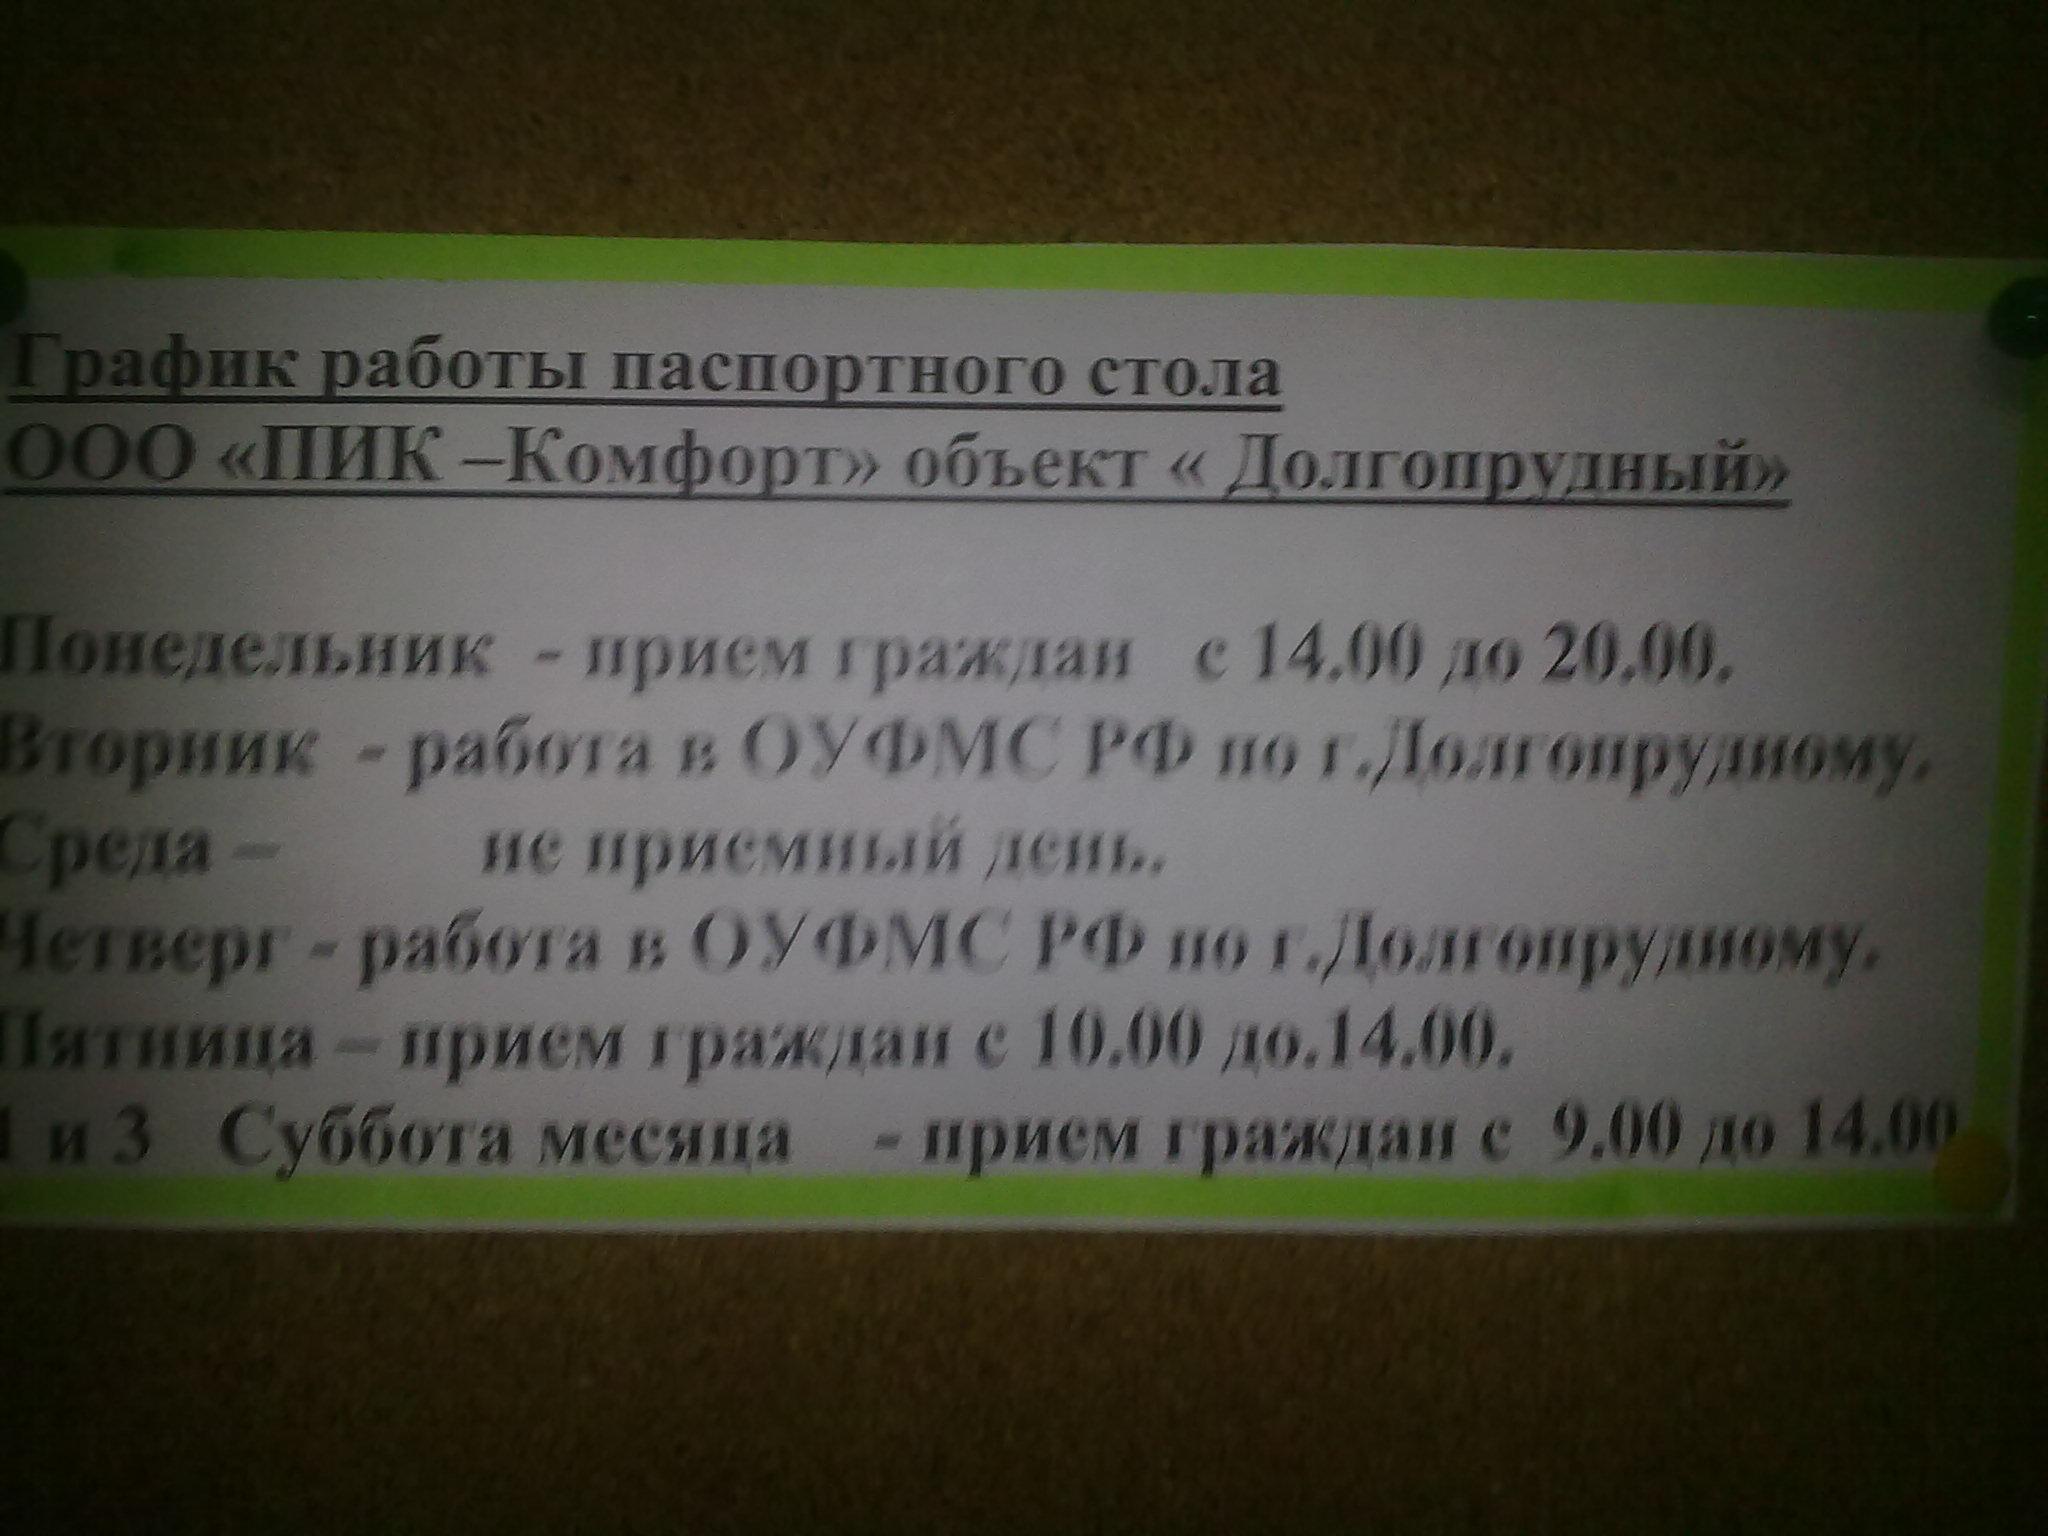 http://forum.darnet.ru/img_attach/740.jpg